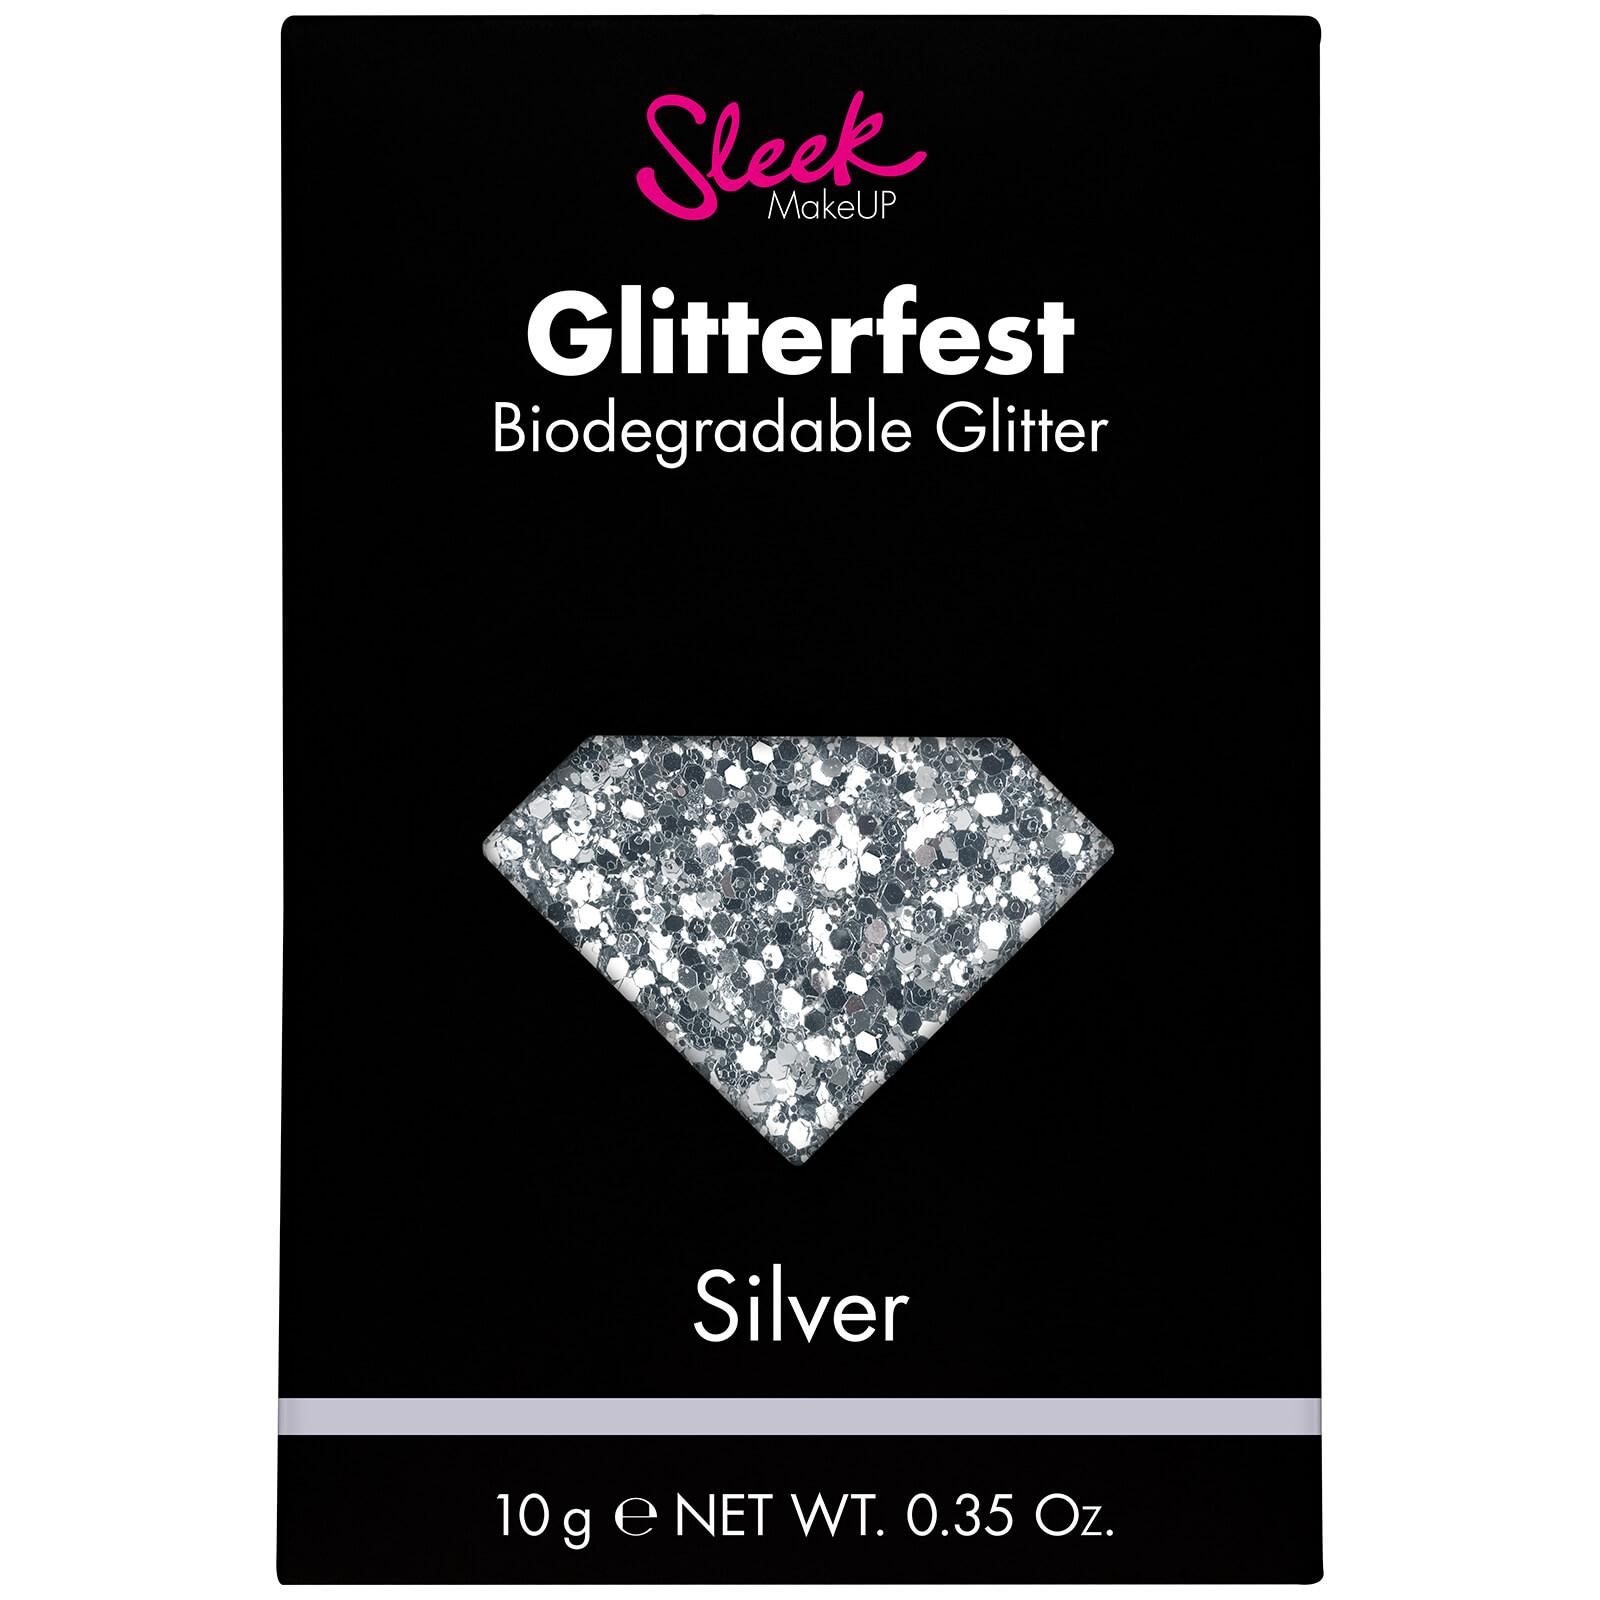 Купить Биоразлагаемый глиттер для тела Sleek MakeUP Glitterfest Biodegradable Glitter - Silver 10 г